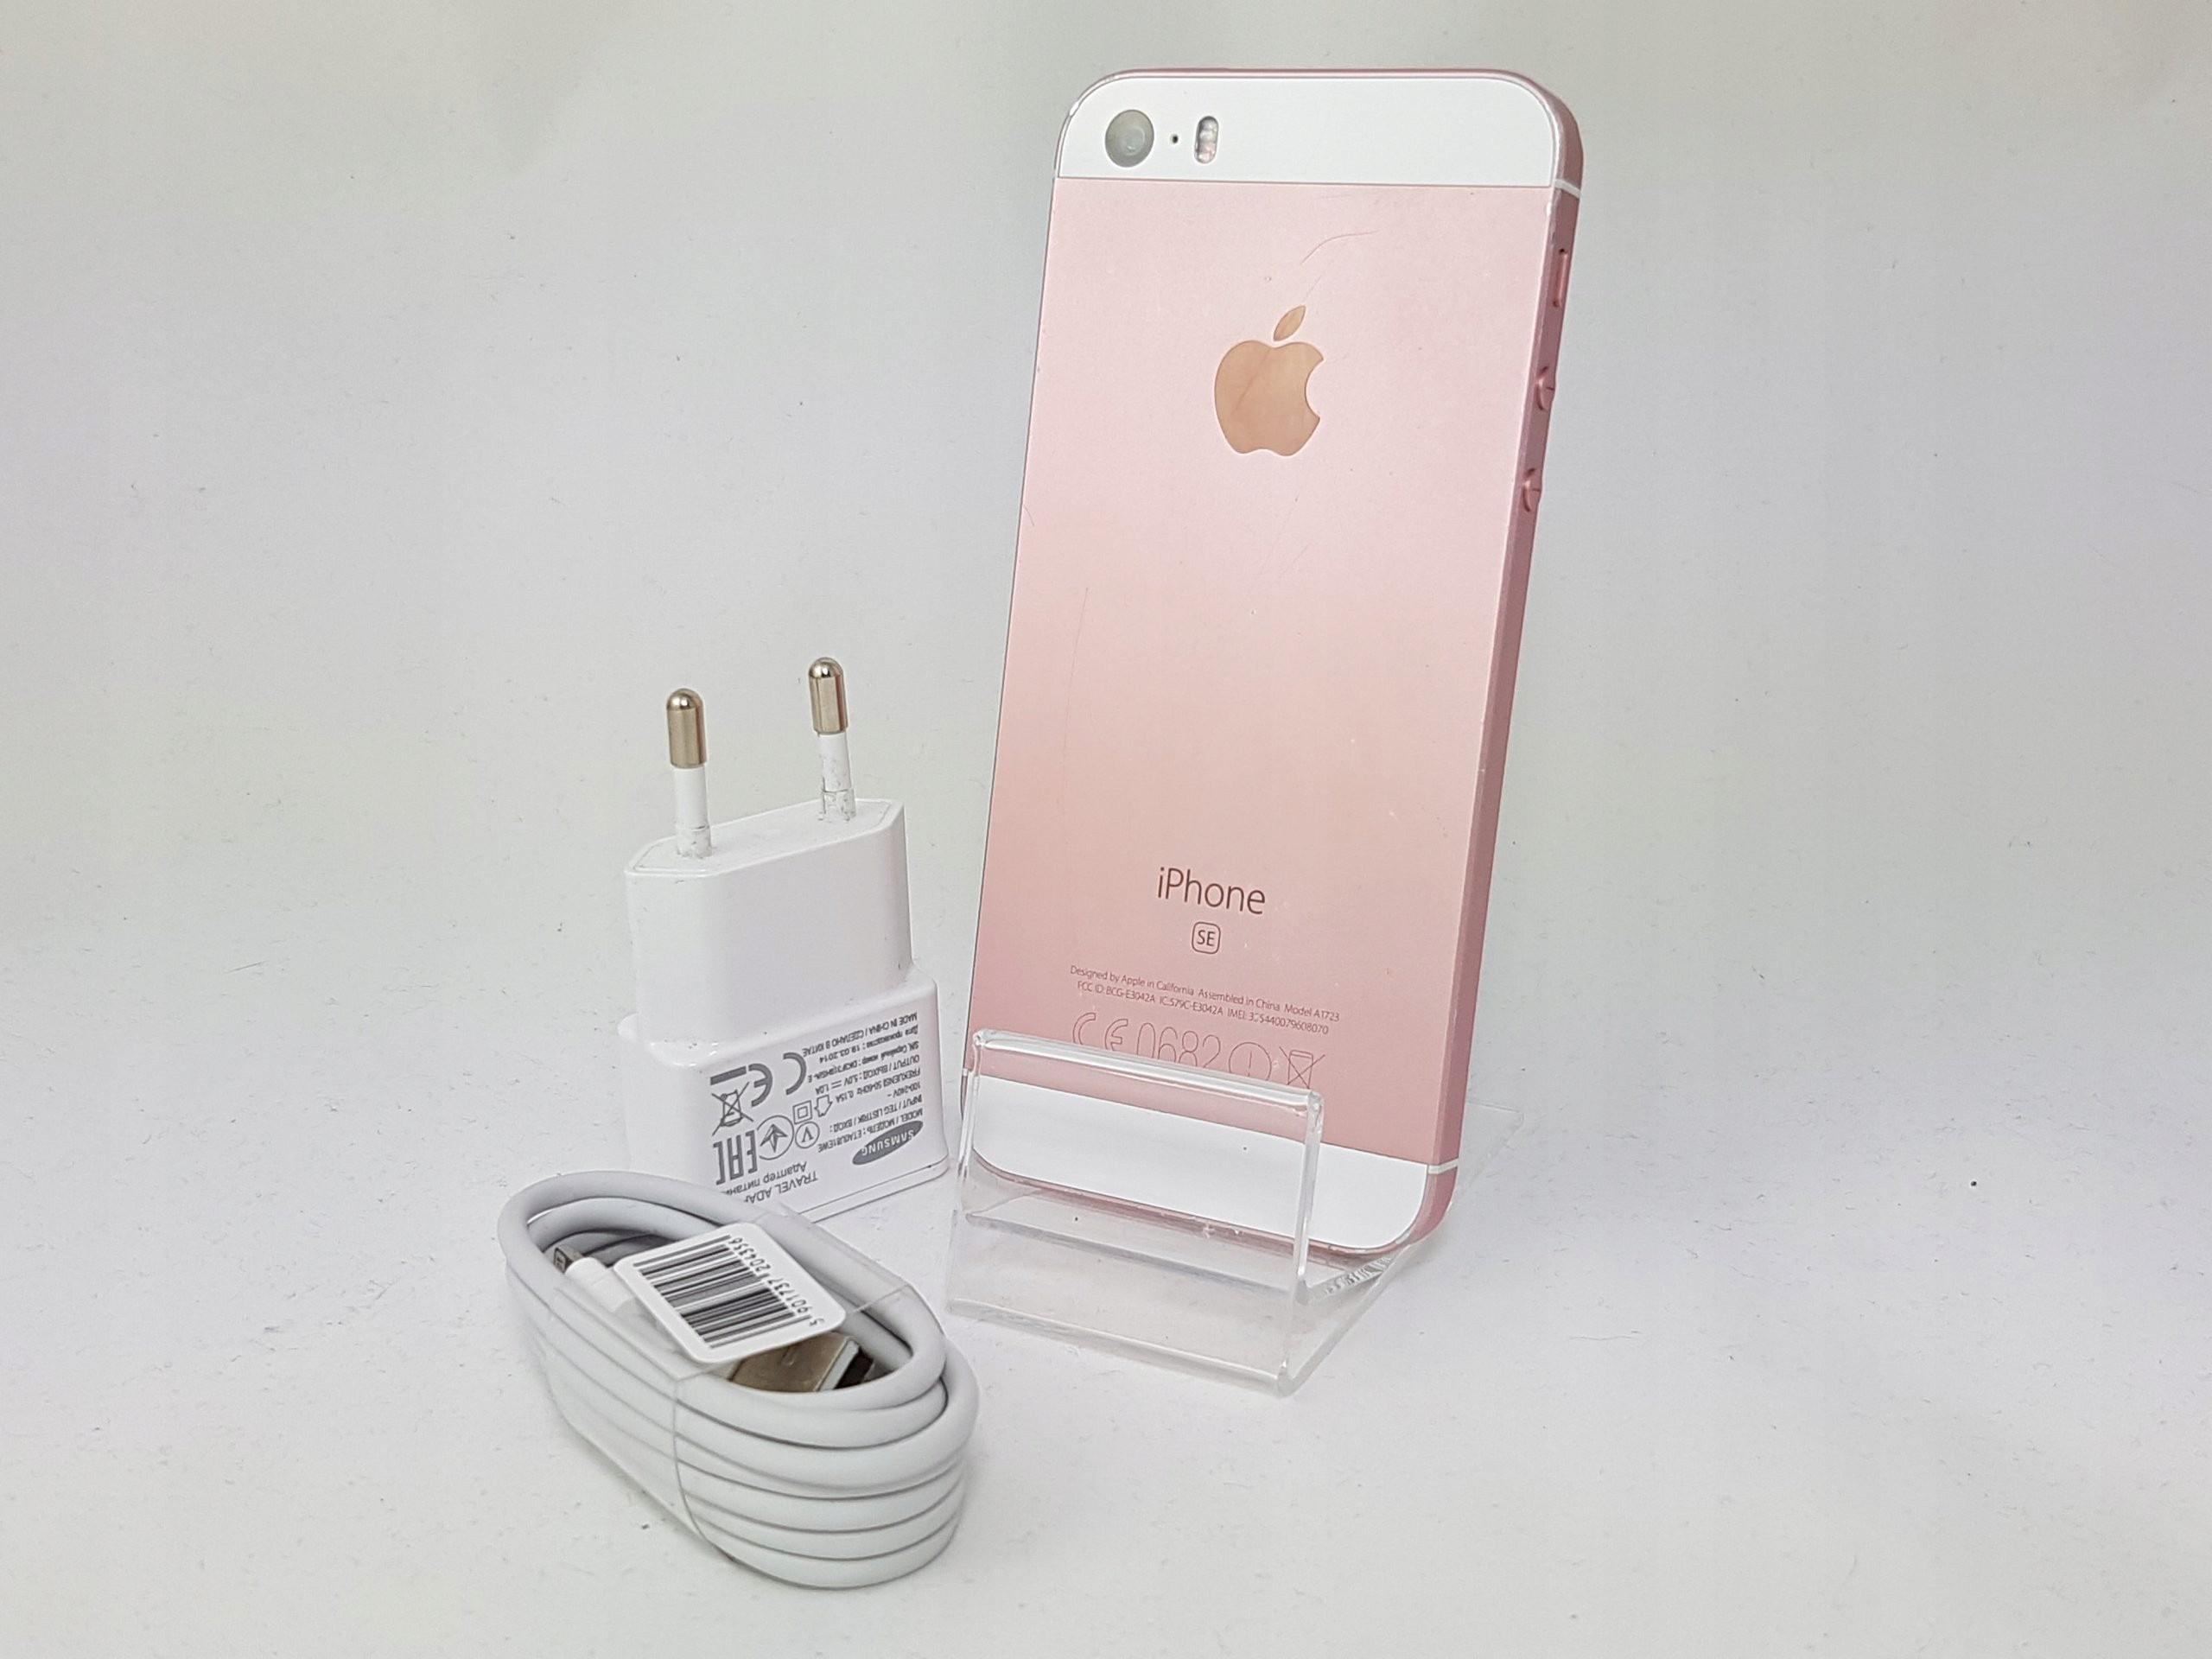 Apple Iphone Se 64gb Rose Gold A1723 24h Fv23 7400349776